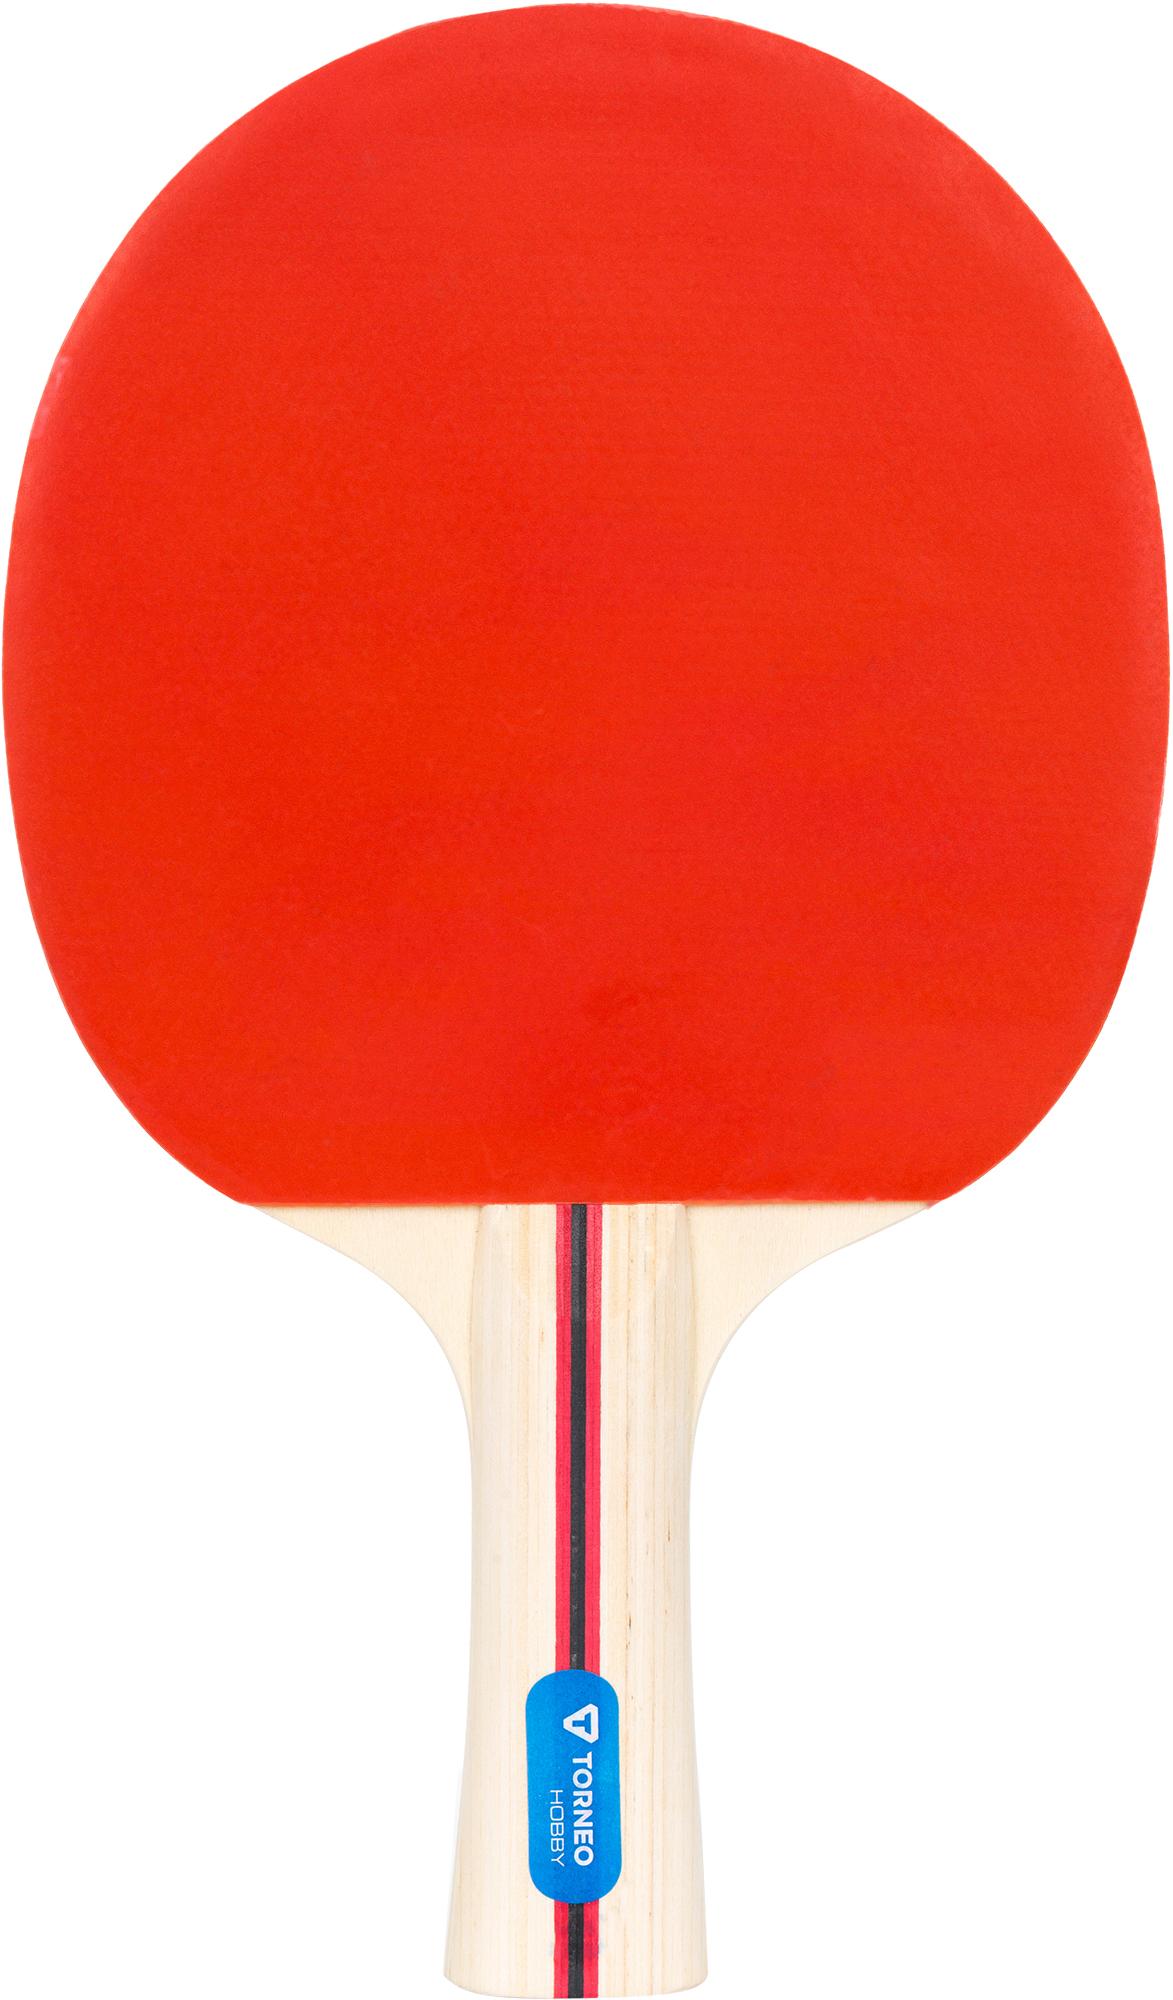 Torneo Ракетка для настольного тенниса Torneo Hobby torneo ракетка для настольного тенниса torneo training